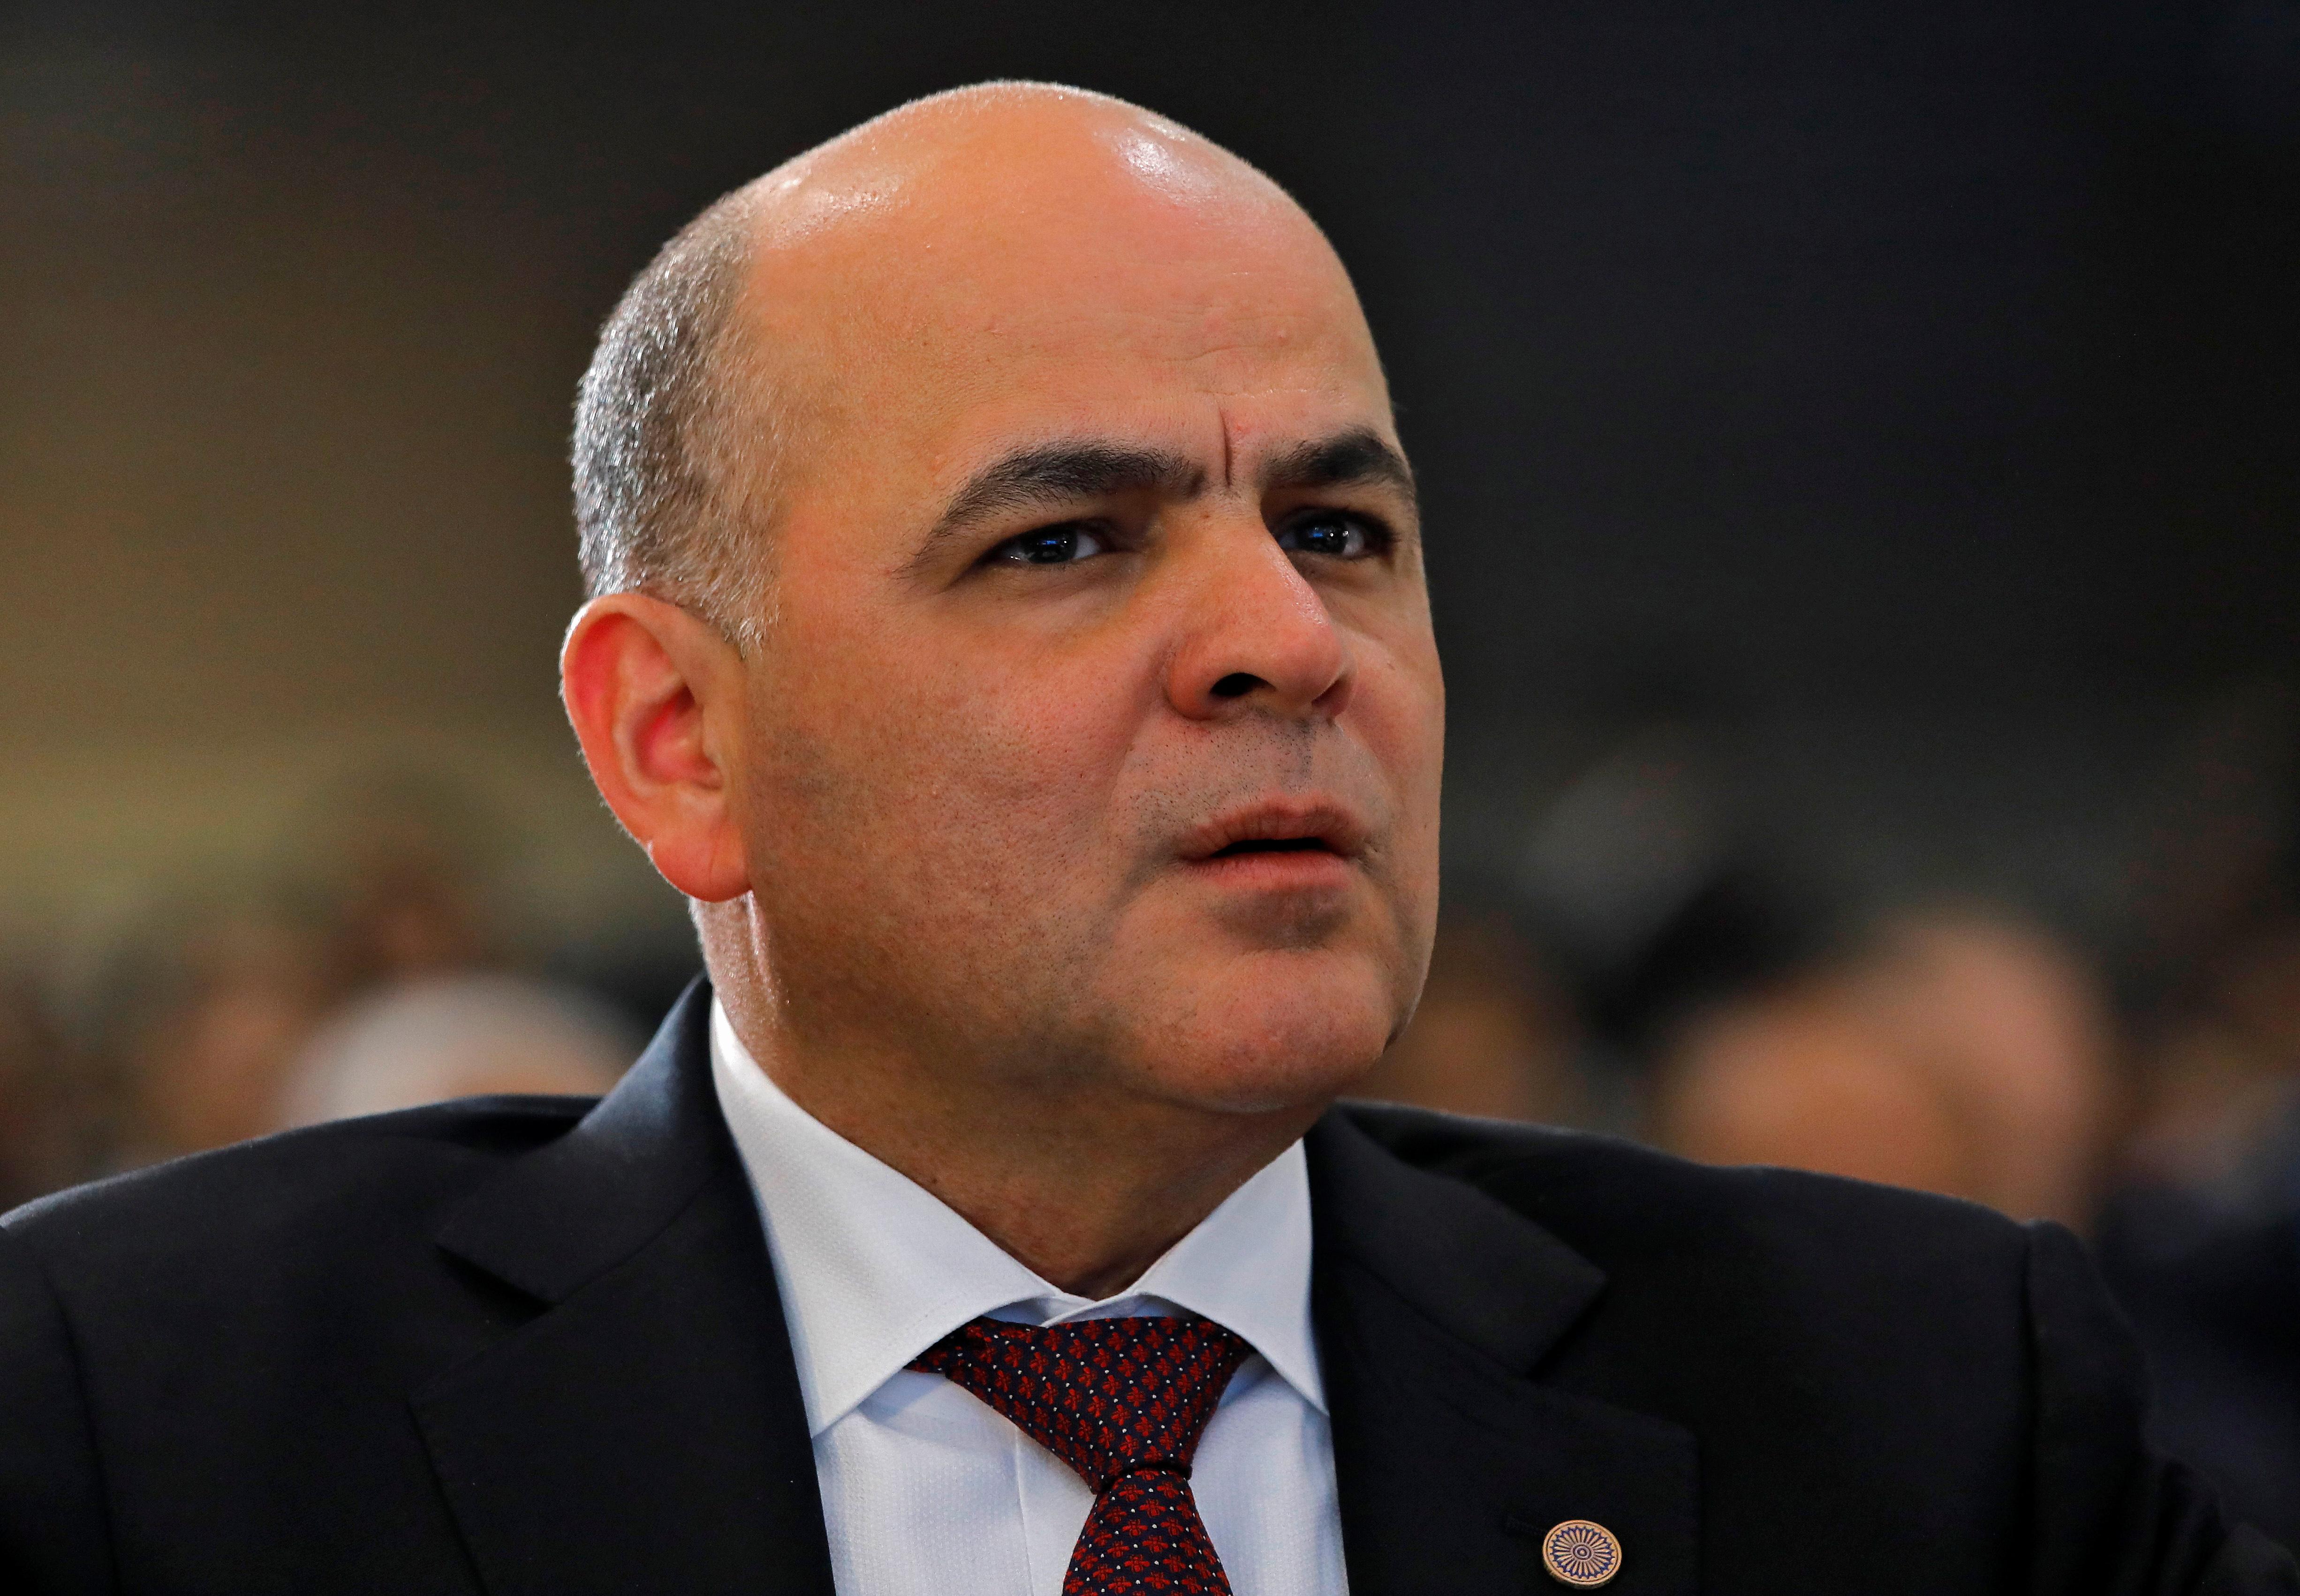 Venezuela may divert U.S.-bound oil to Rosneft, says Jose generator working